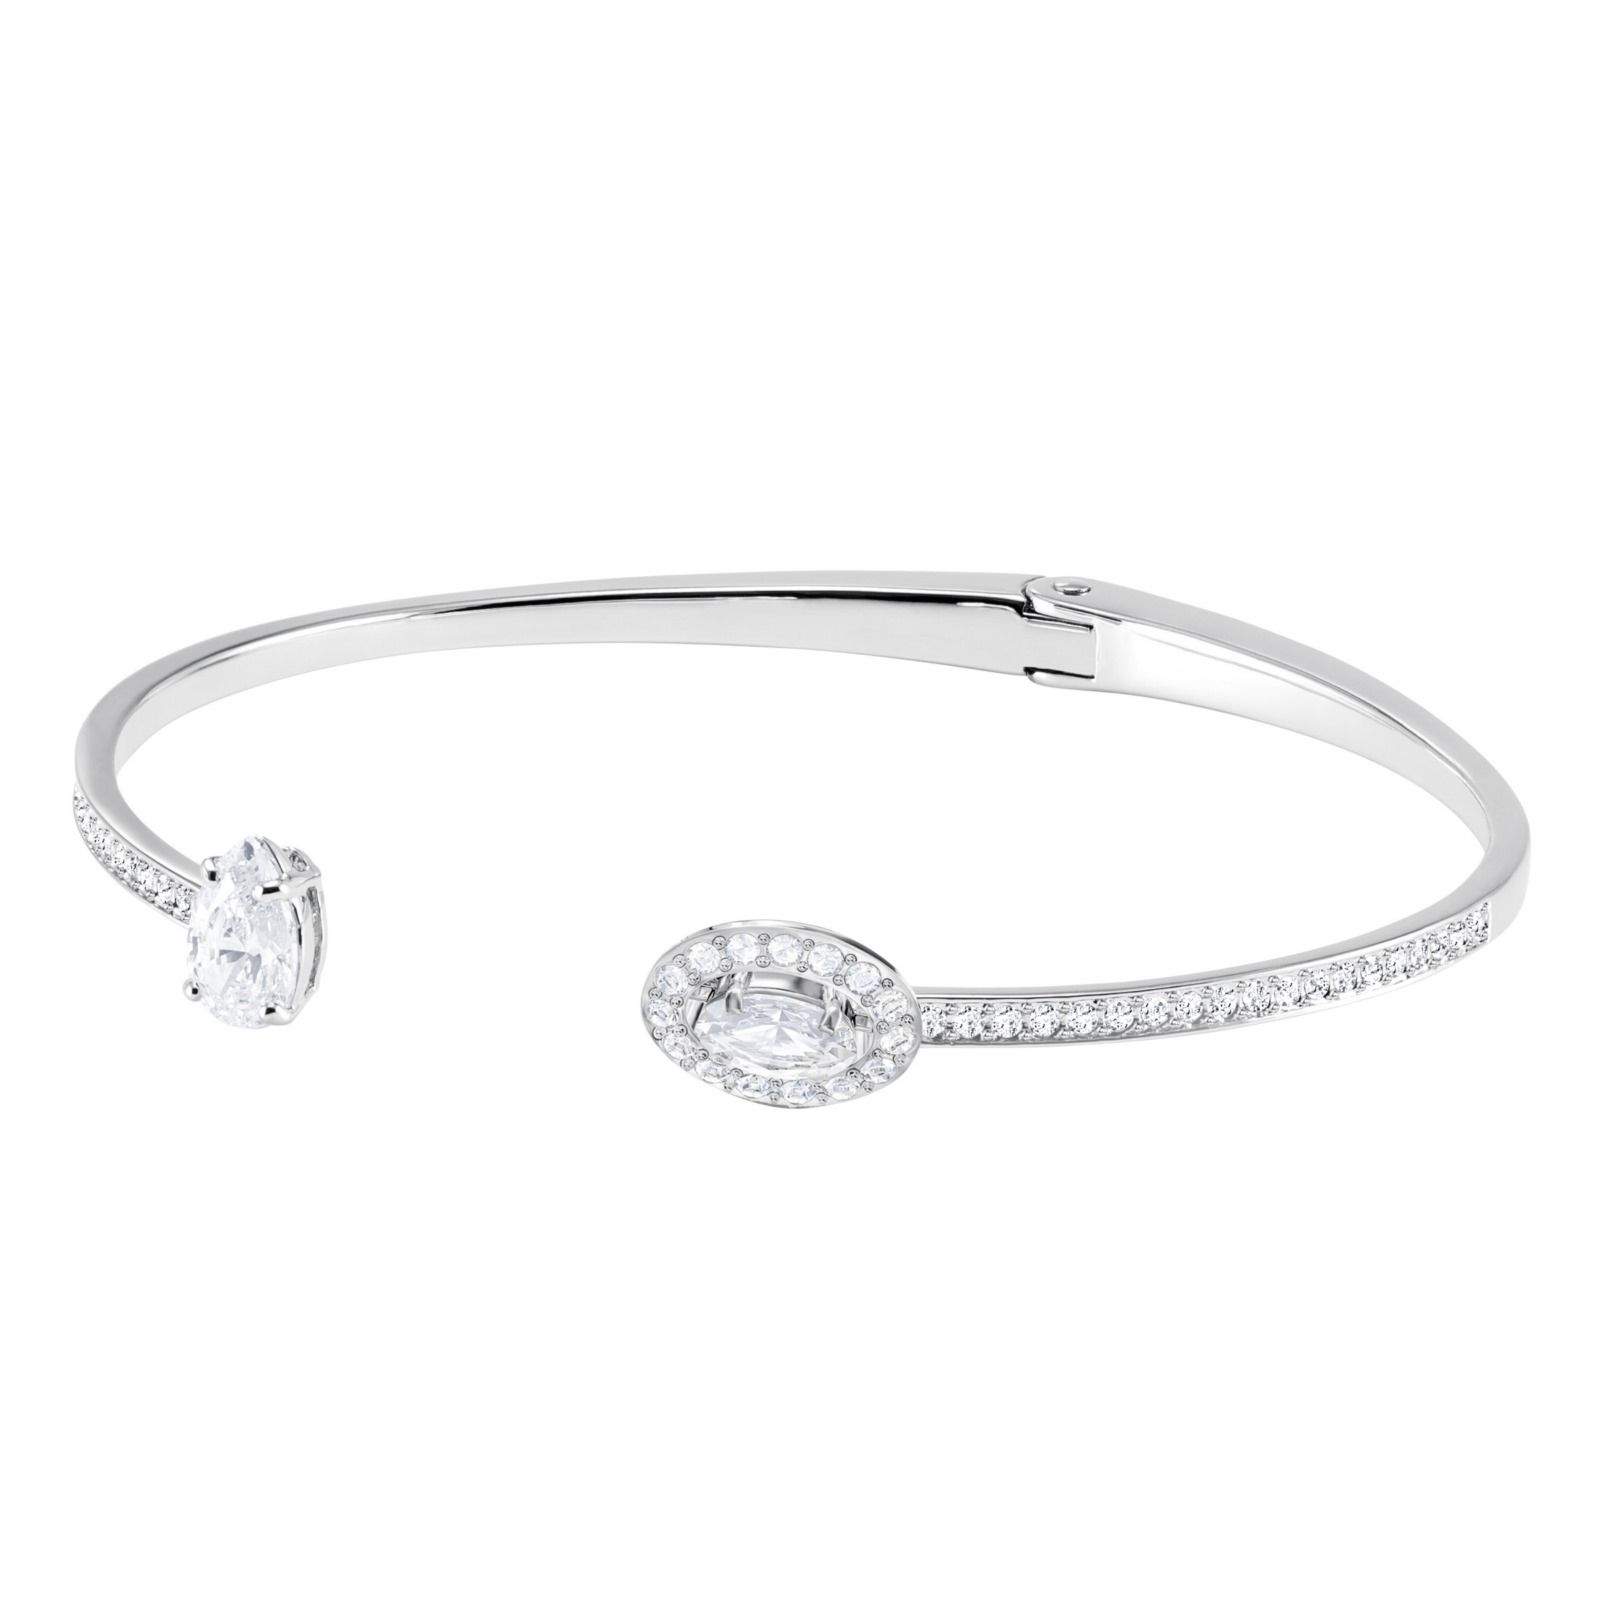 Bracelet jonc Swarovski Attract Square en cristaux Swarovski et acier, taille S vue 1